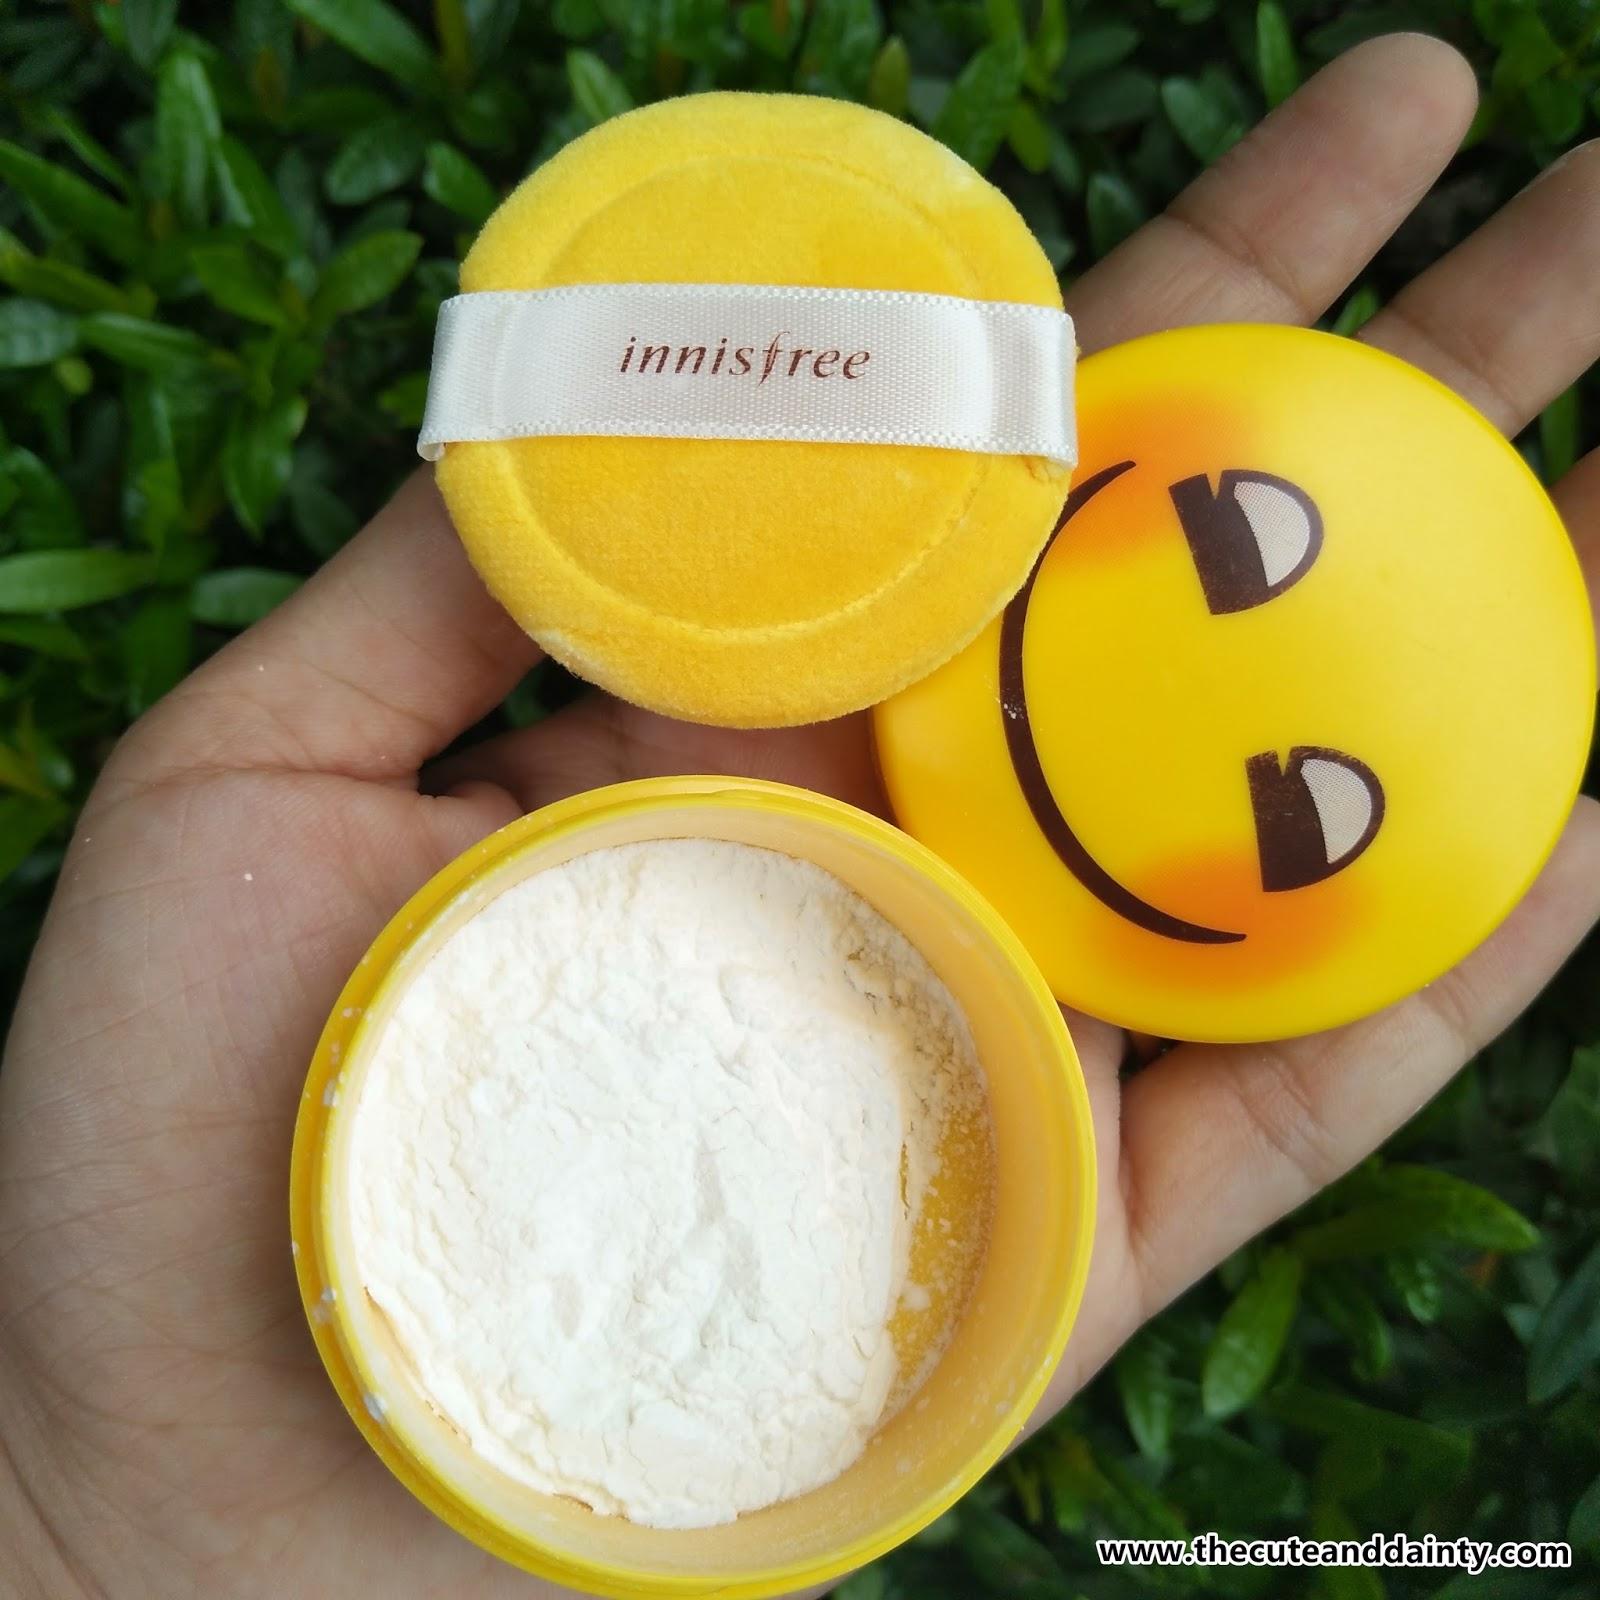 No Sebum Mineral Powder by innisfree #4